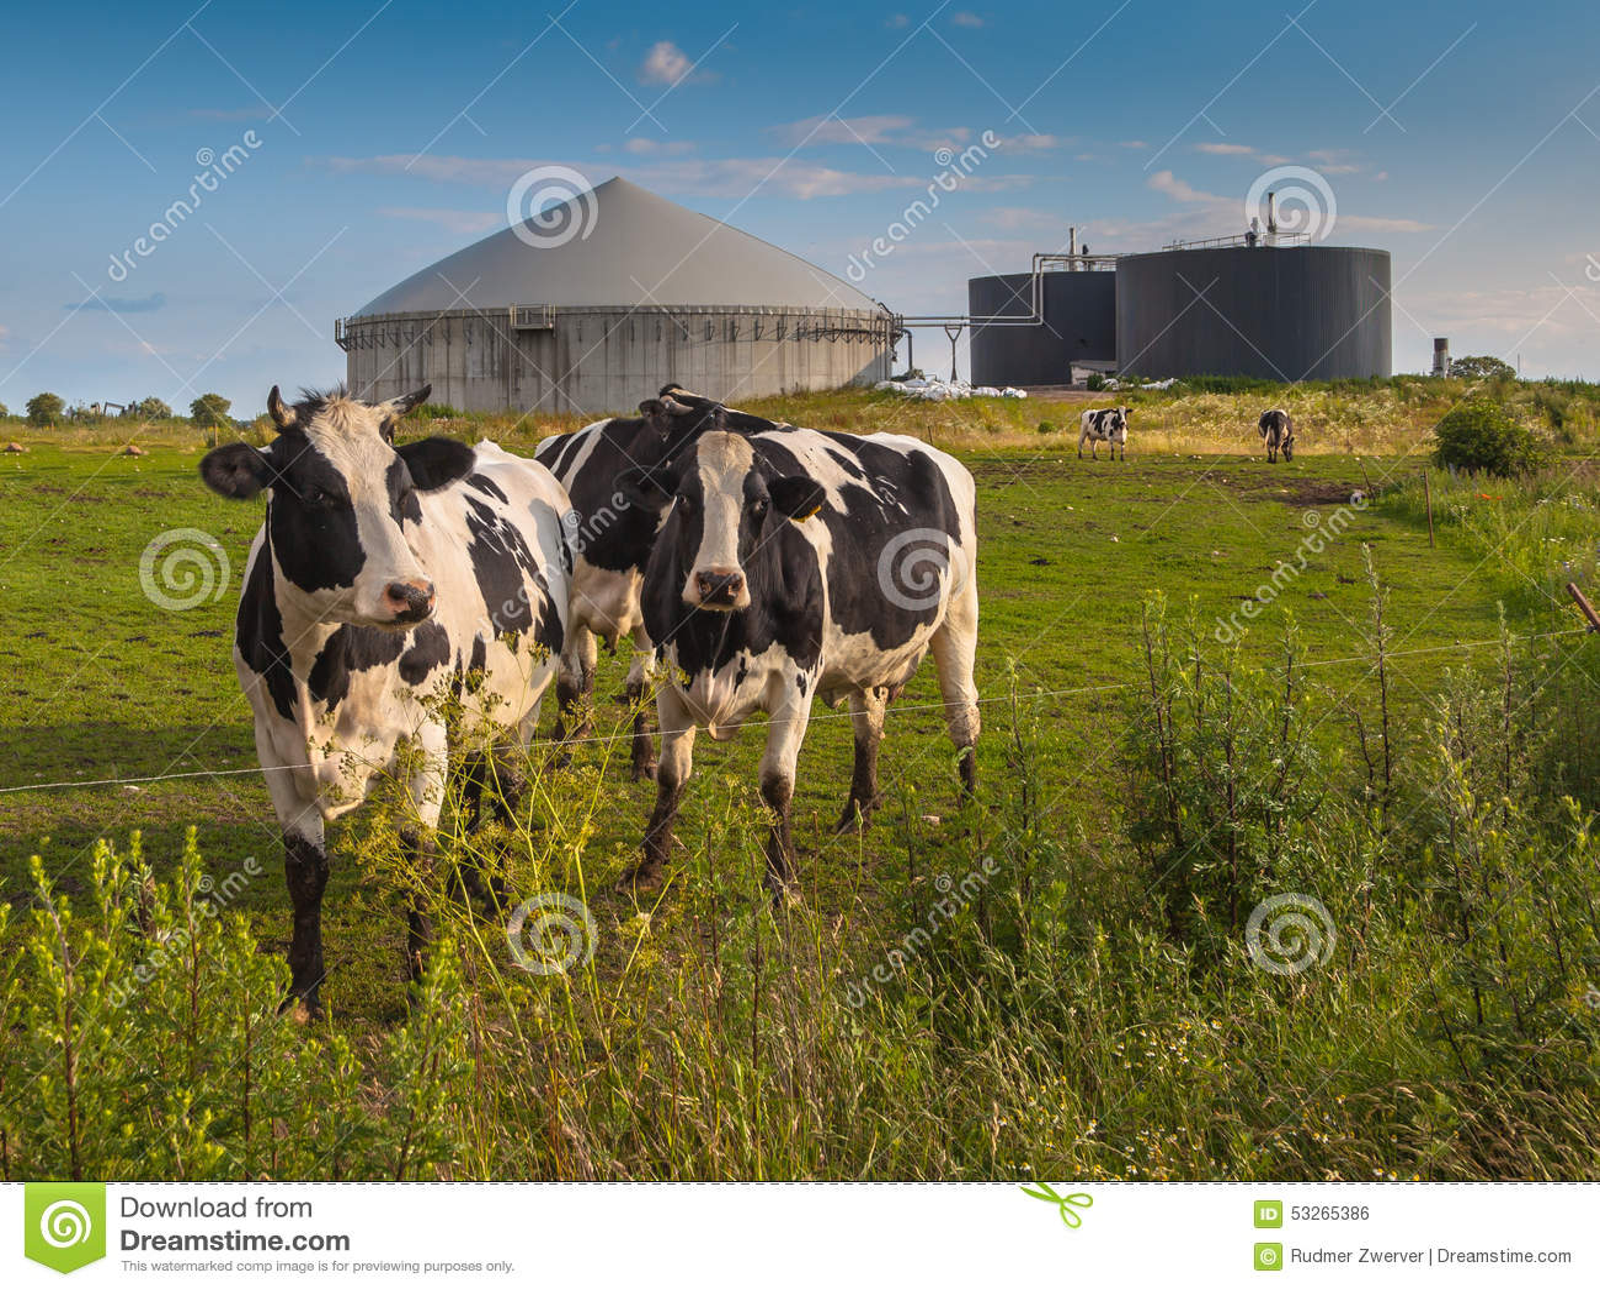 biogas cow - photo #4